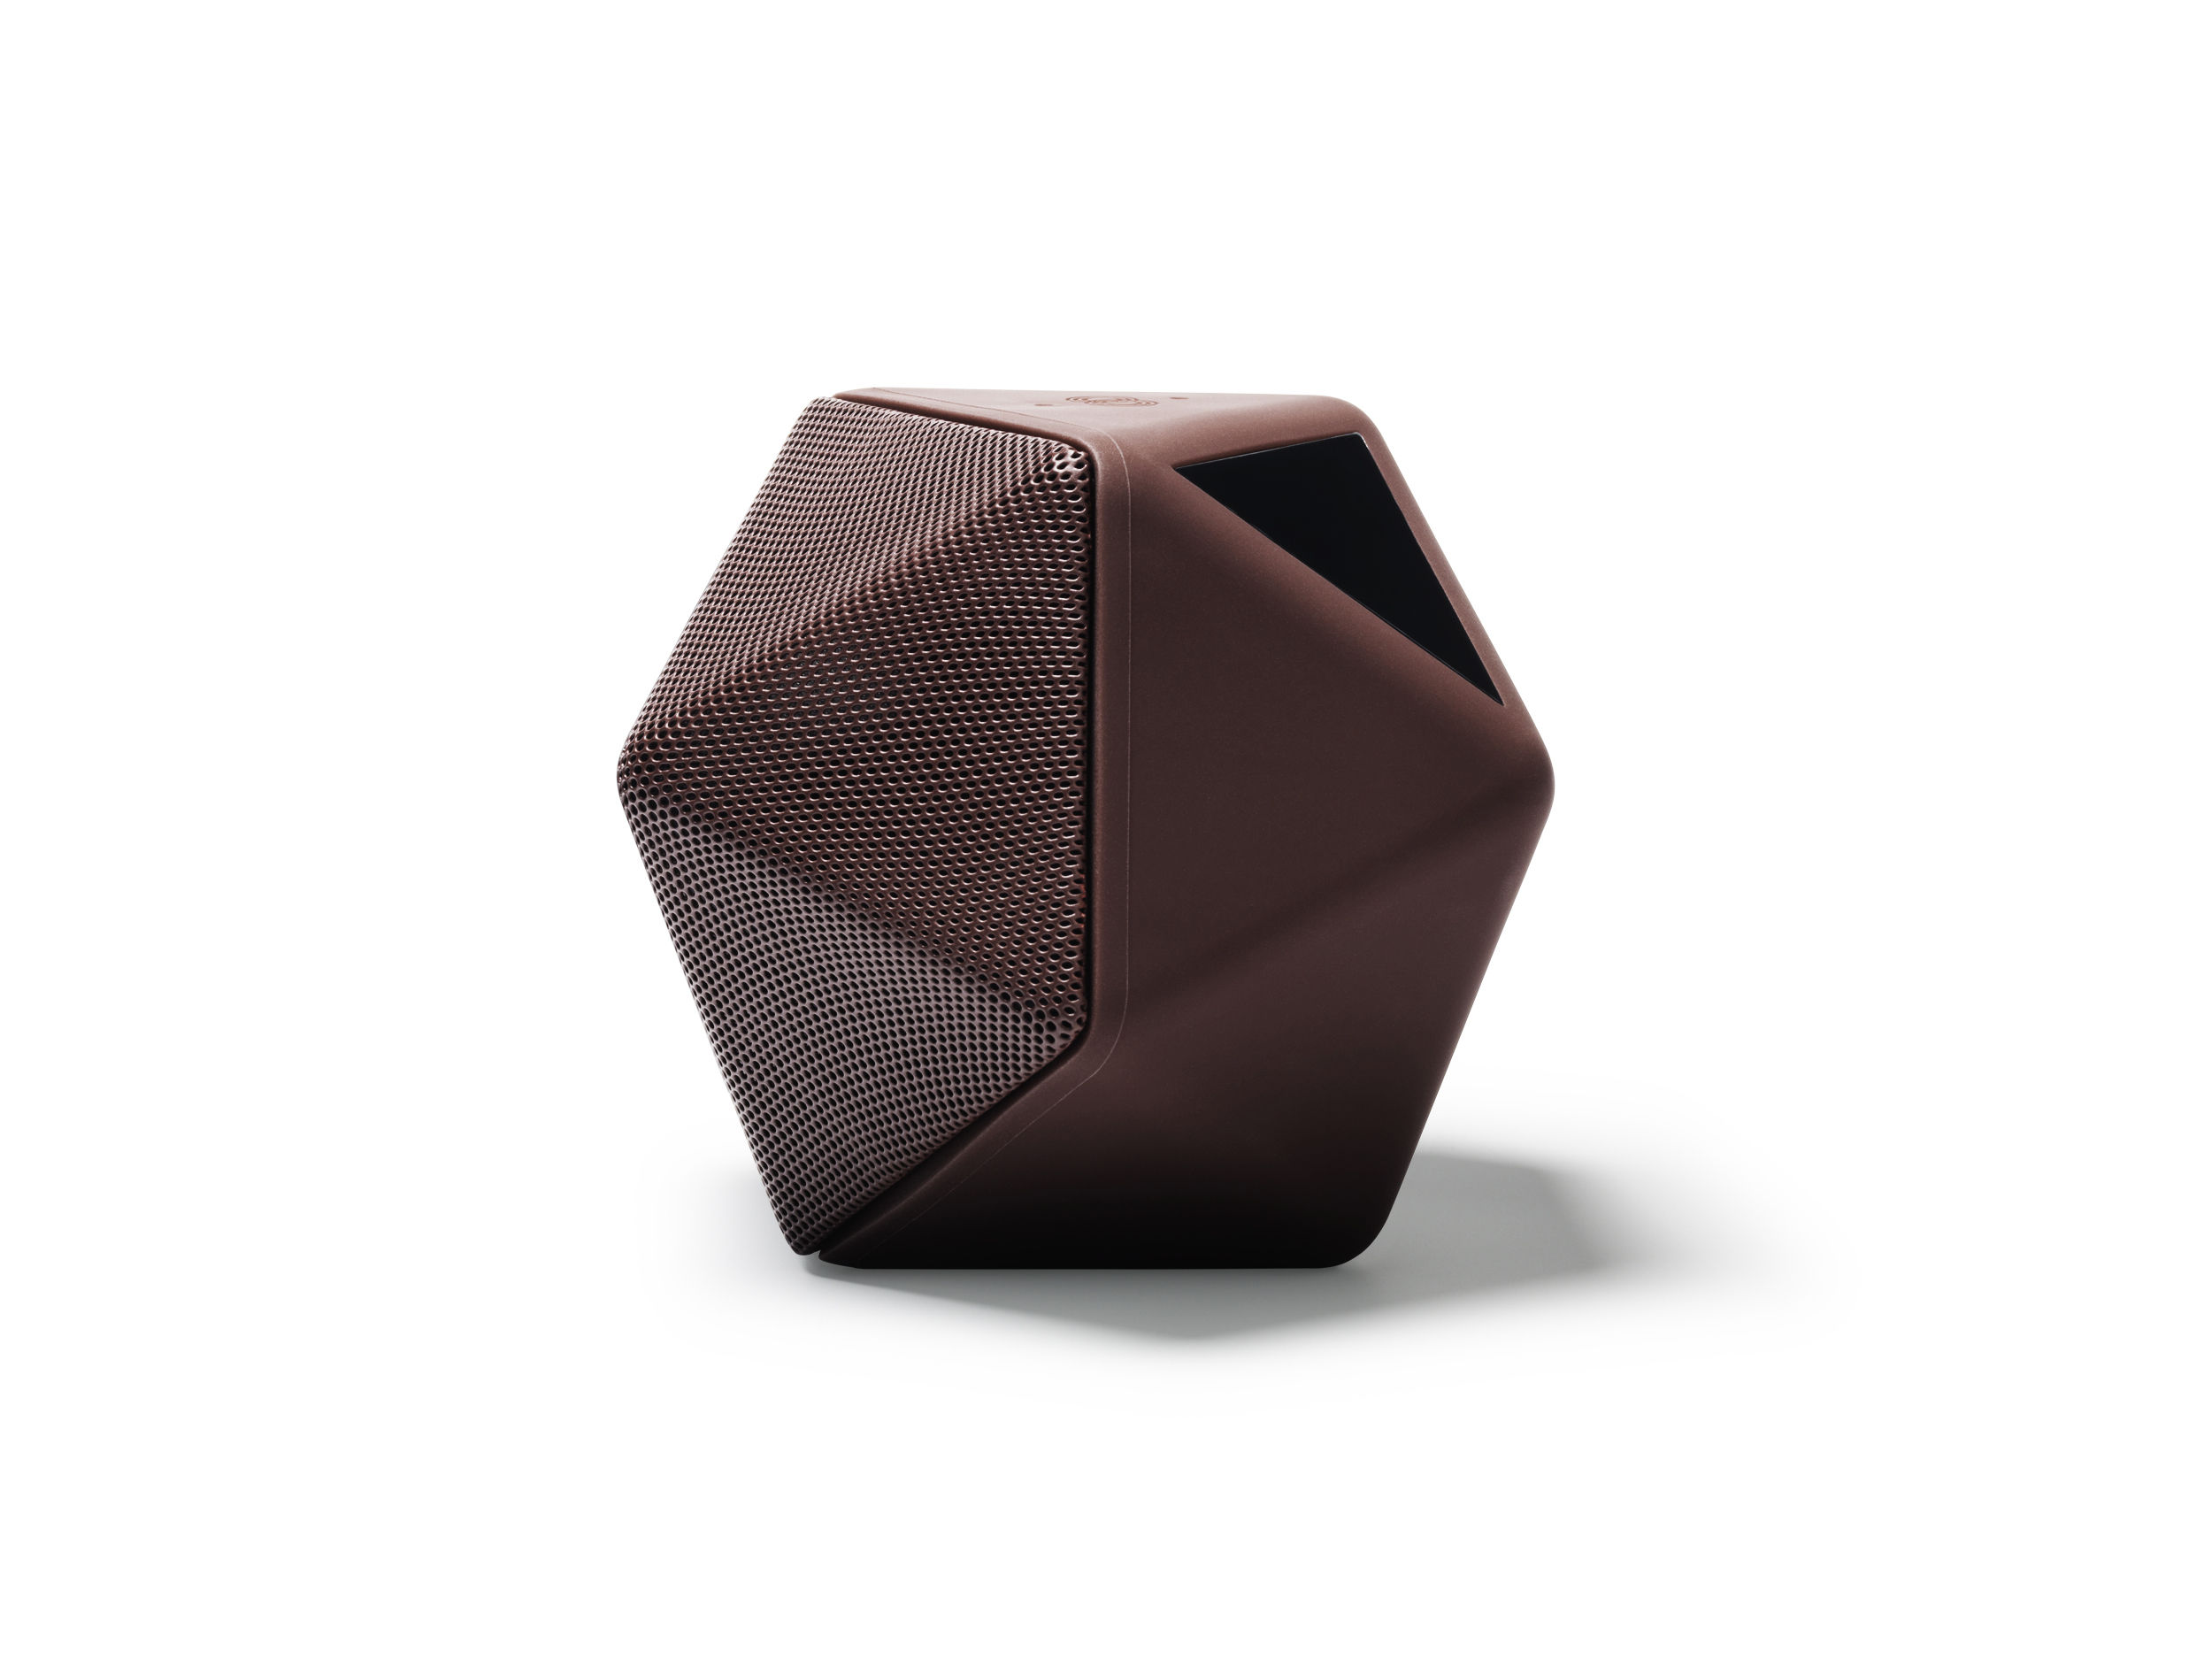 boom boom aufnahmeger t kabellos binauric. Black Bedroom Furniture Sets. Home Design Ideas